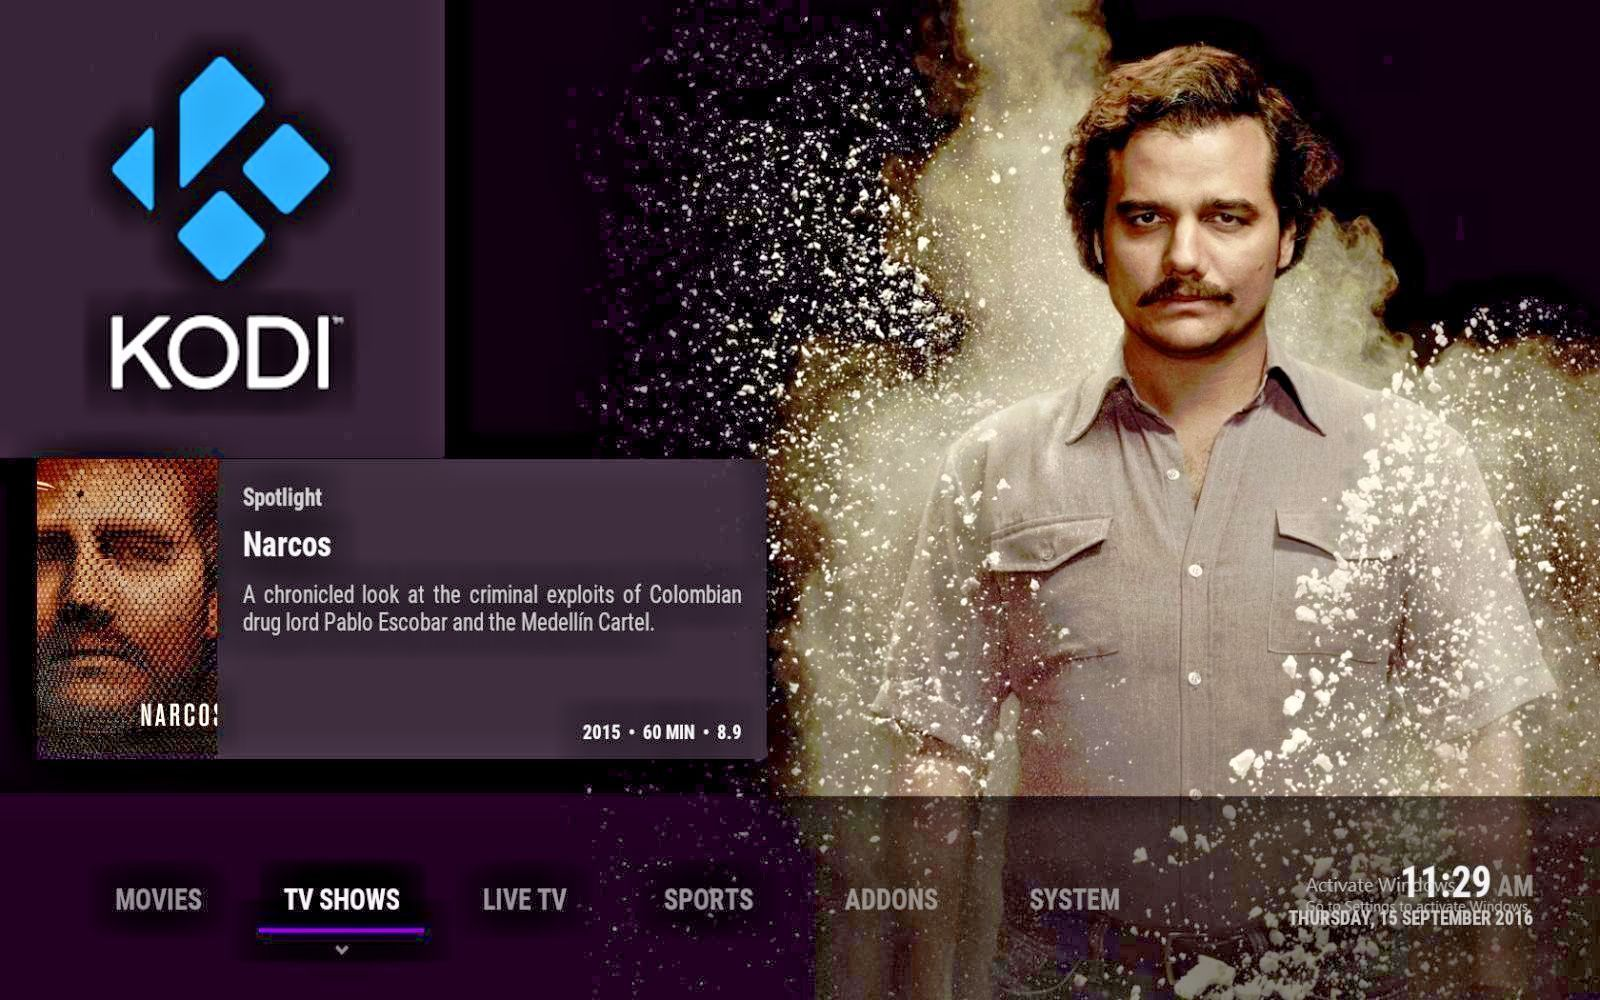 AMAZON FIRE TV STICK XBMC KODI 16.1 MOVIES LIVE TV TV SHOWS SPORTS XXX https://t.co/HwfhHnBNA5 https://t.co/QLTcdJw3YI